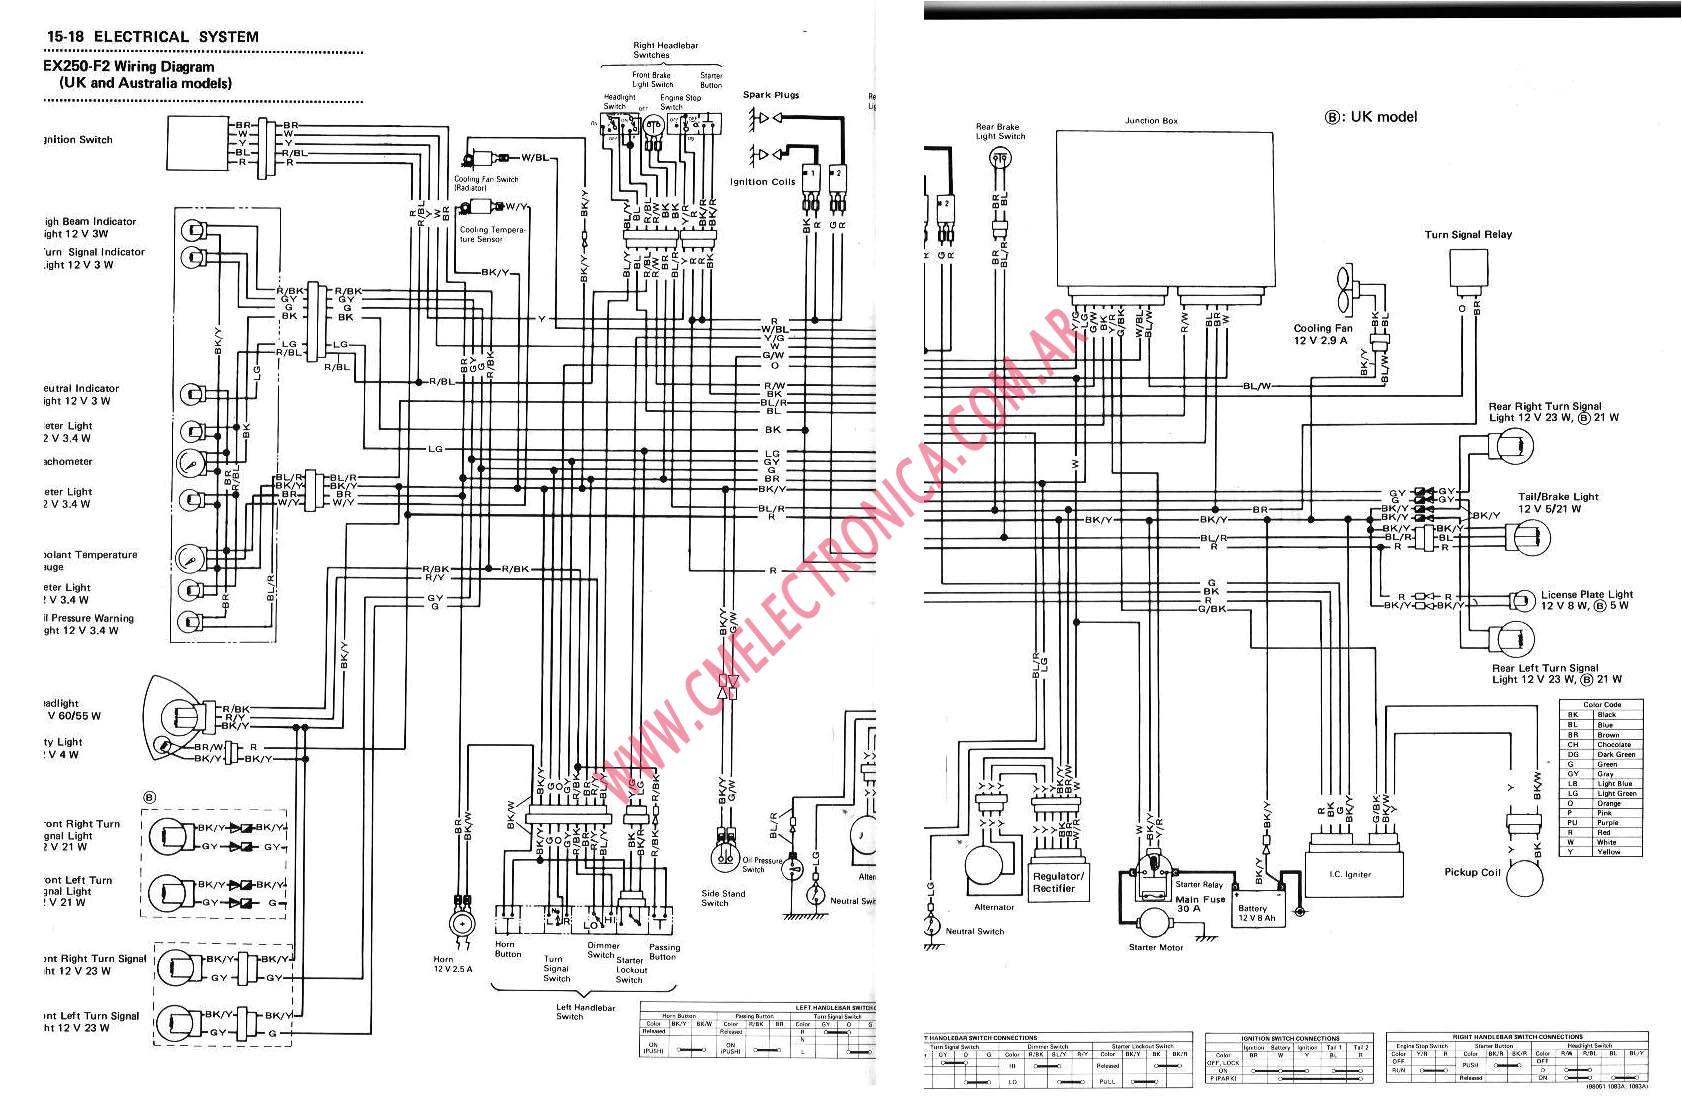 Kawasaki Mule 610 Ignition Switch Wiring Diagram Klr250 Wiring Diagram Kobe Manna15 Immofux Freiburg De